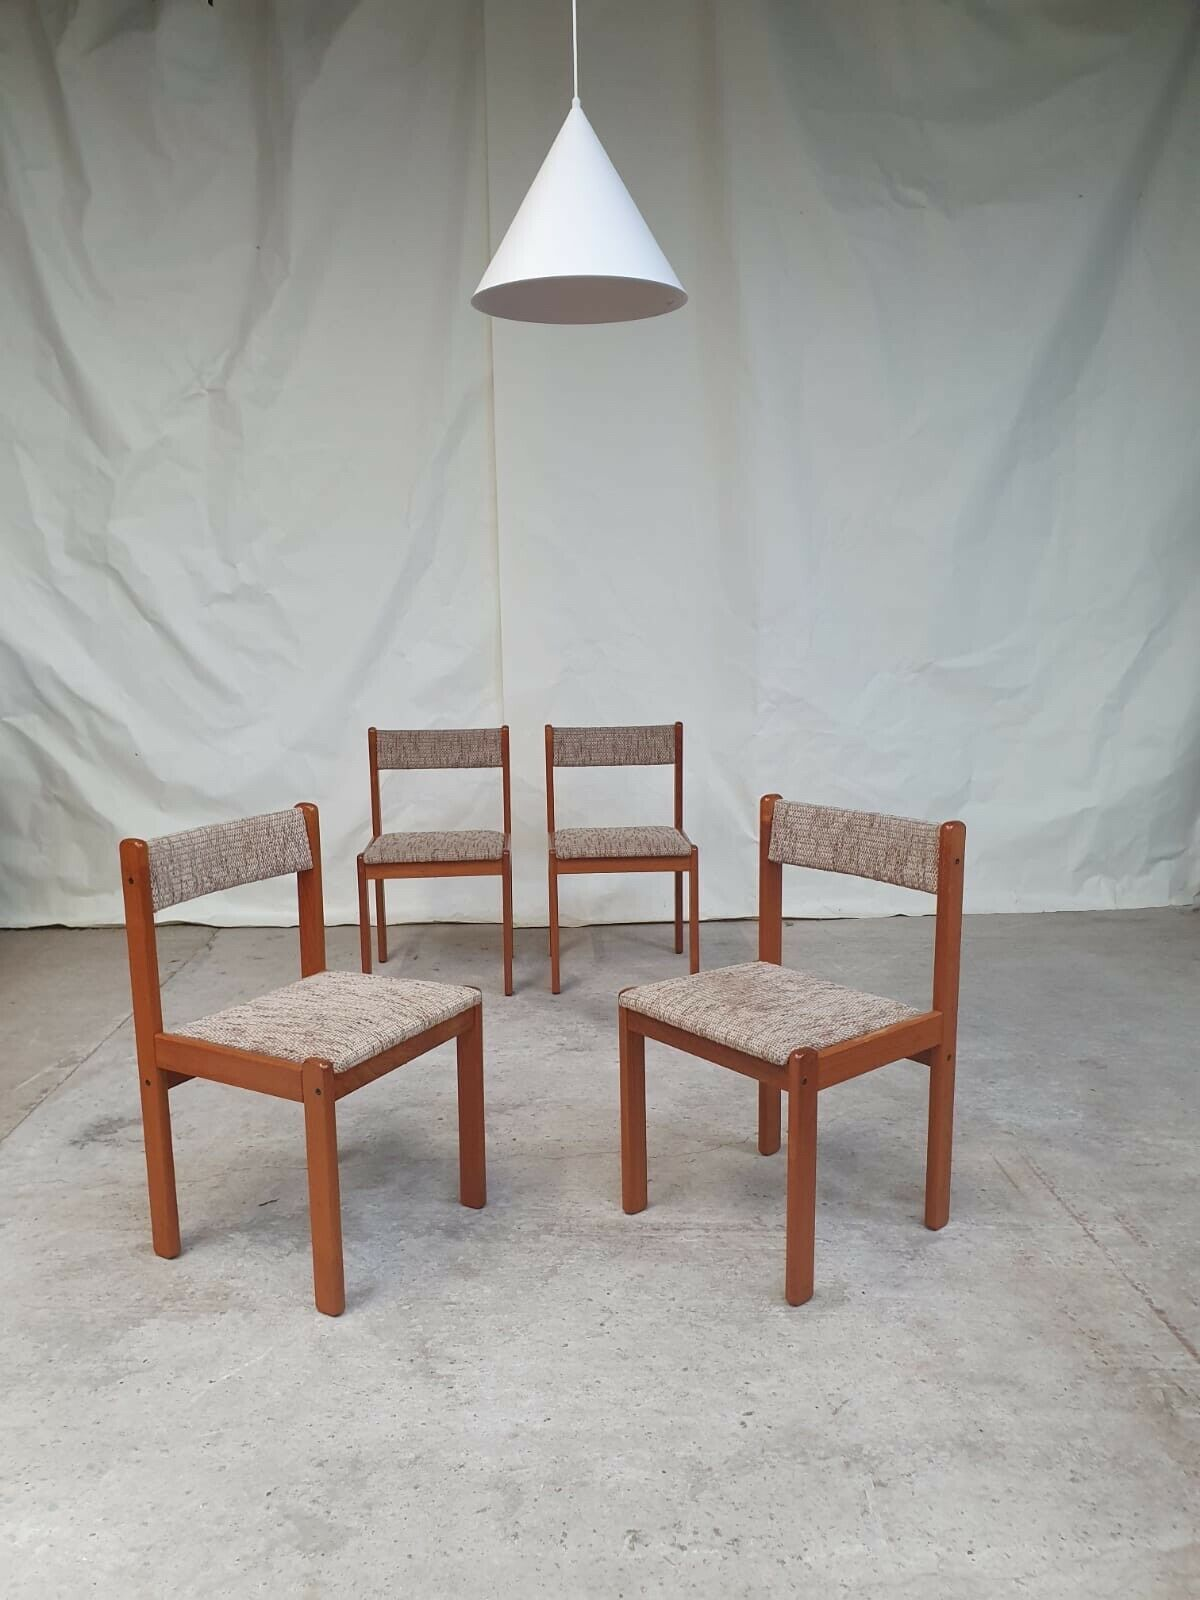 Stunning Vtg Mid Century Set Of 4 Danish Teak Dining Chairs Scandinavian Retro Vinterior